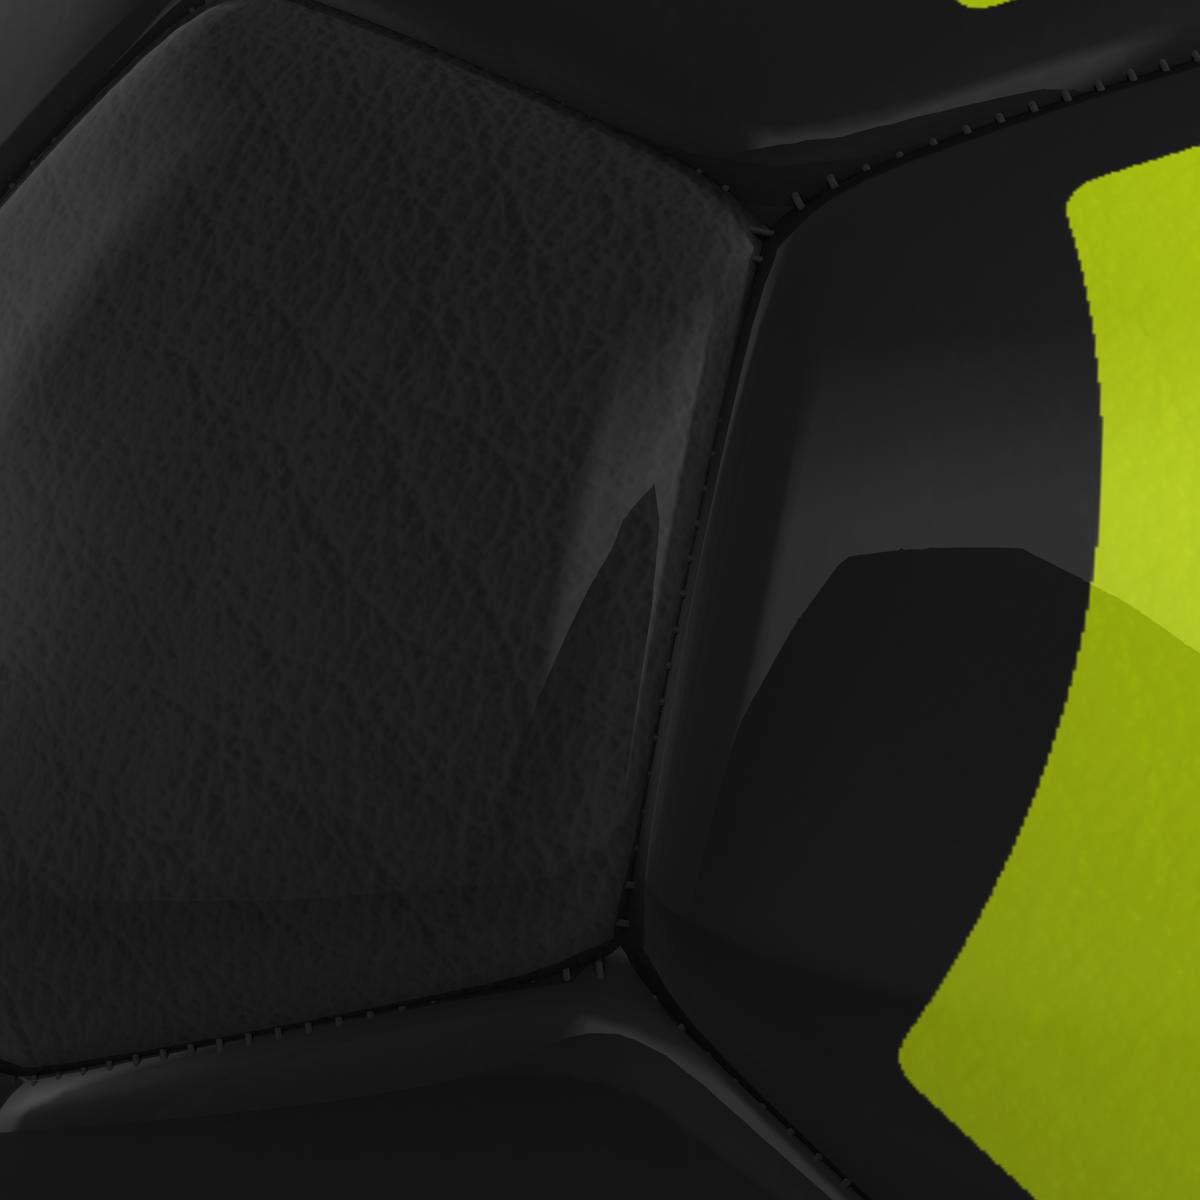 soccerball black yellow 3d model 3ds max fbx c4d ma mb obj 204210